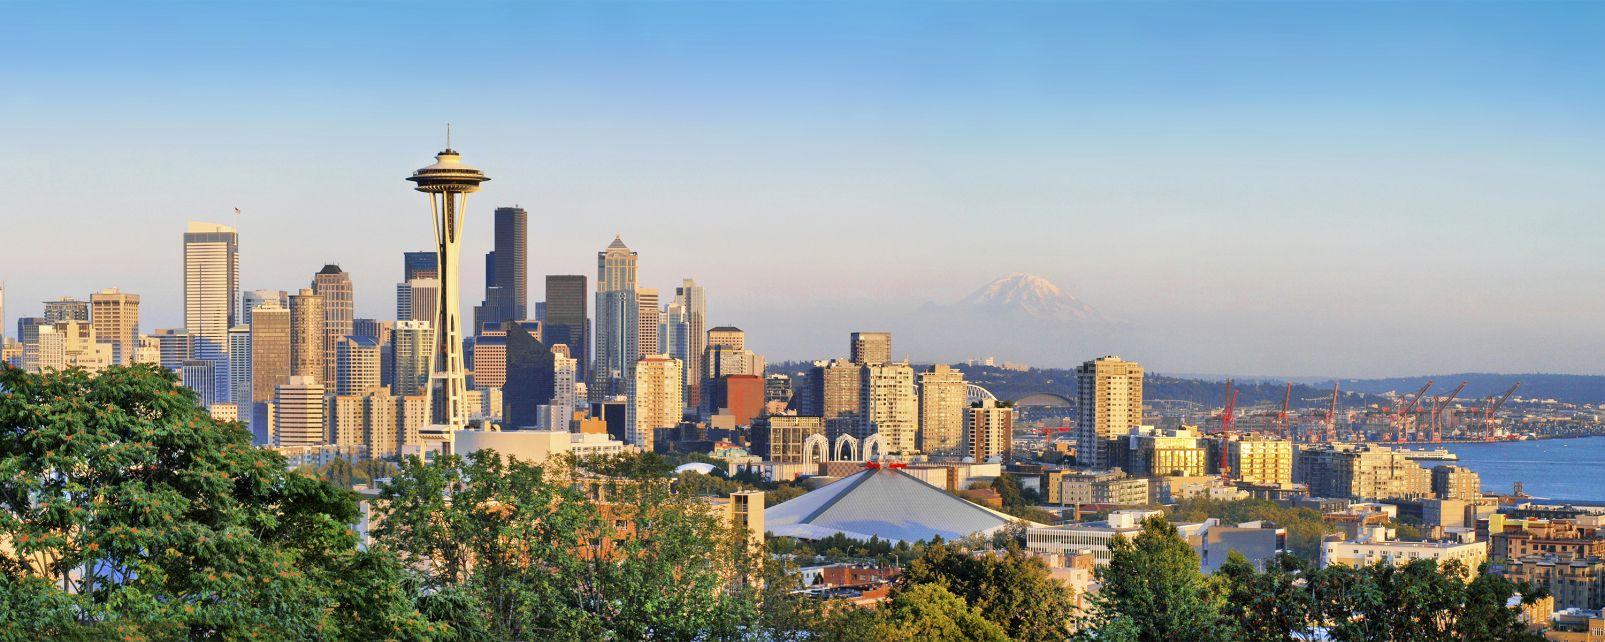 Seattle, Western USA, United States of America